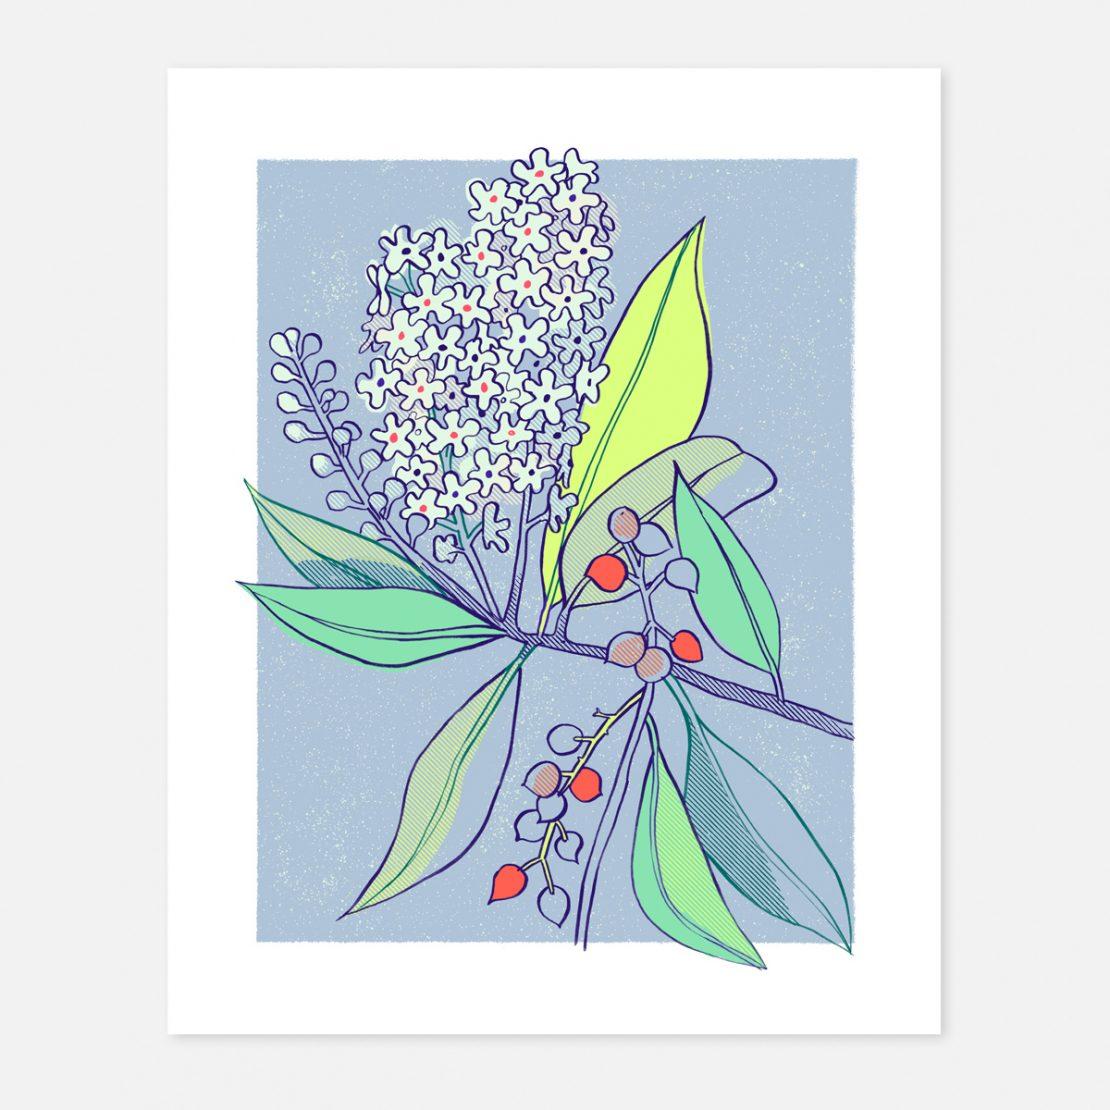 Annalisa Papagna shop - Laurocerasus print 24 x 30 cm